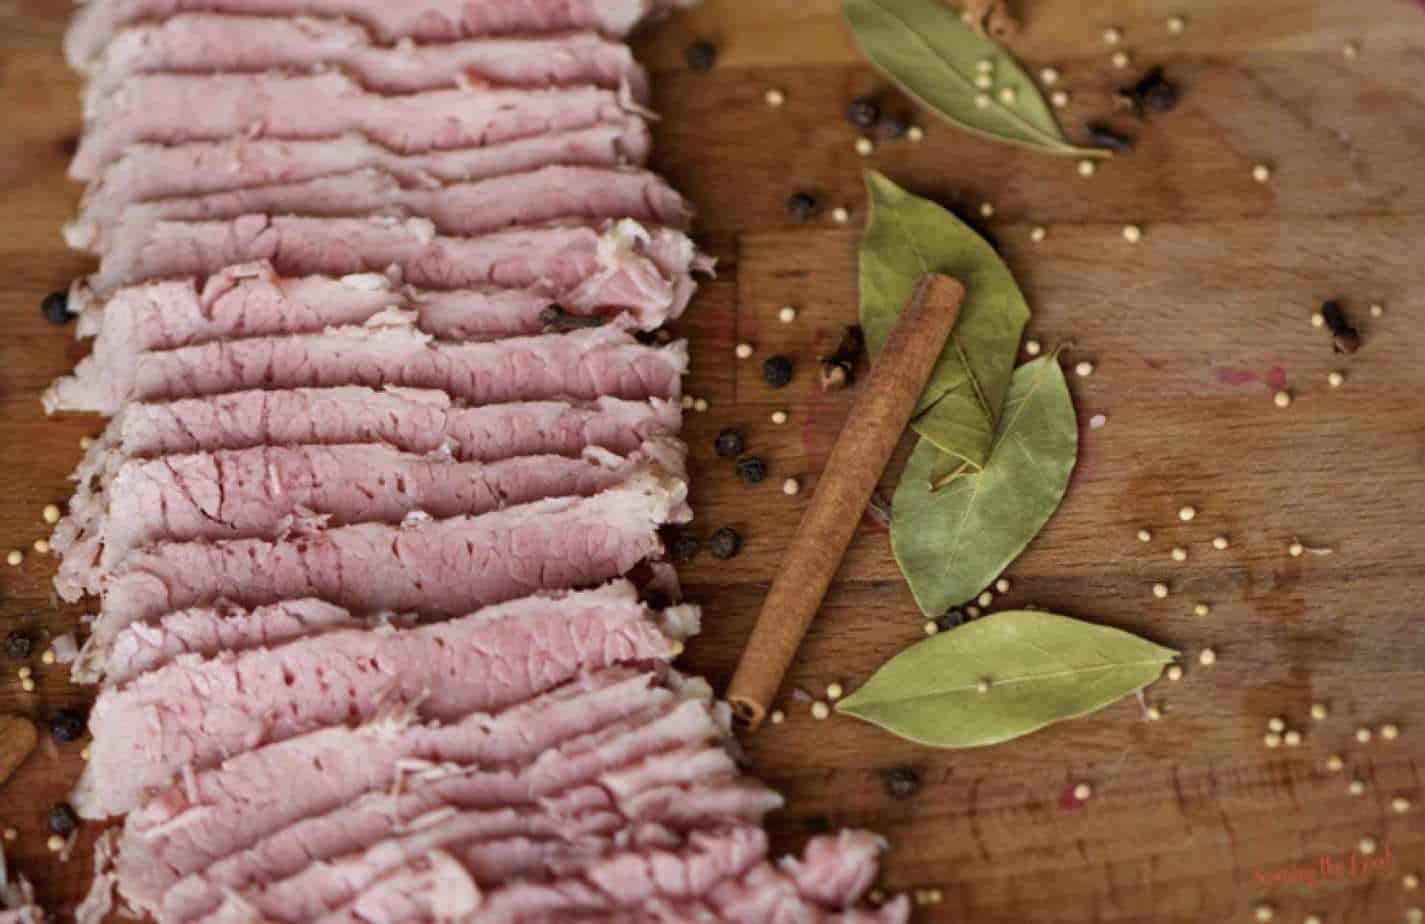 sous vide corned beef, horizontal image